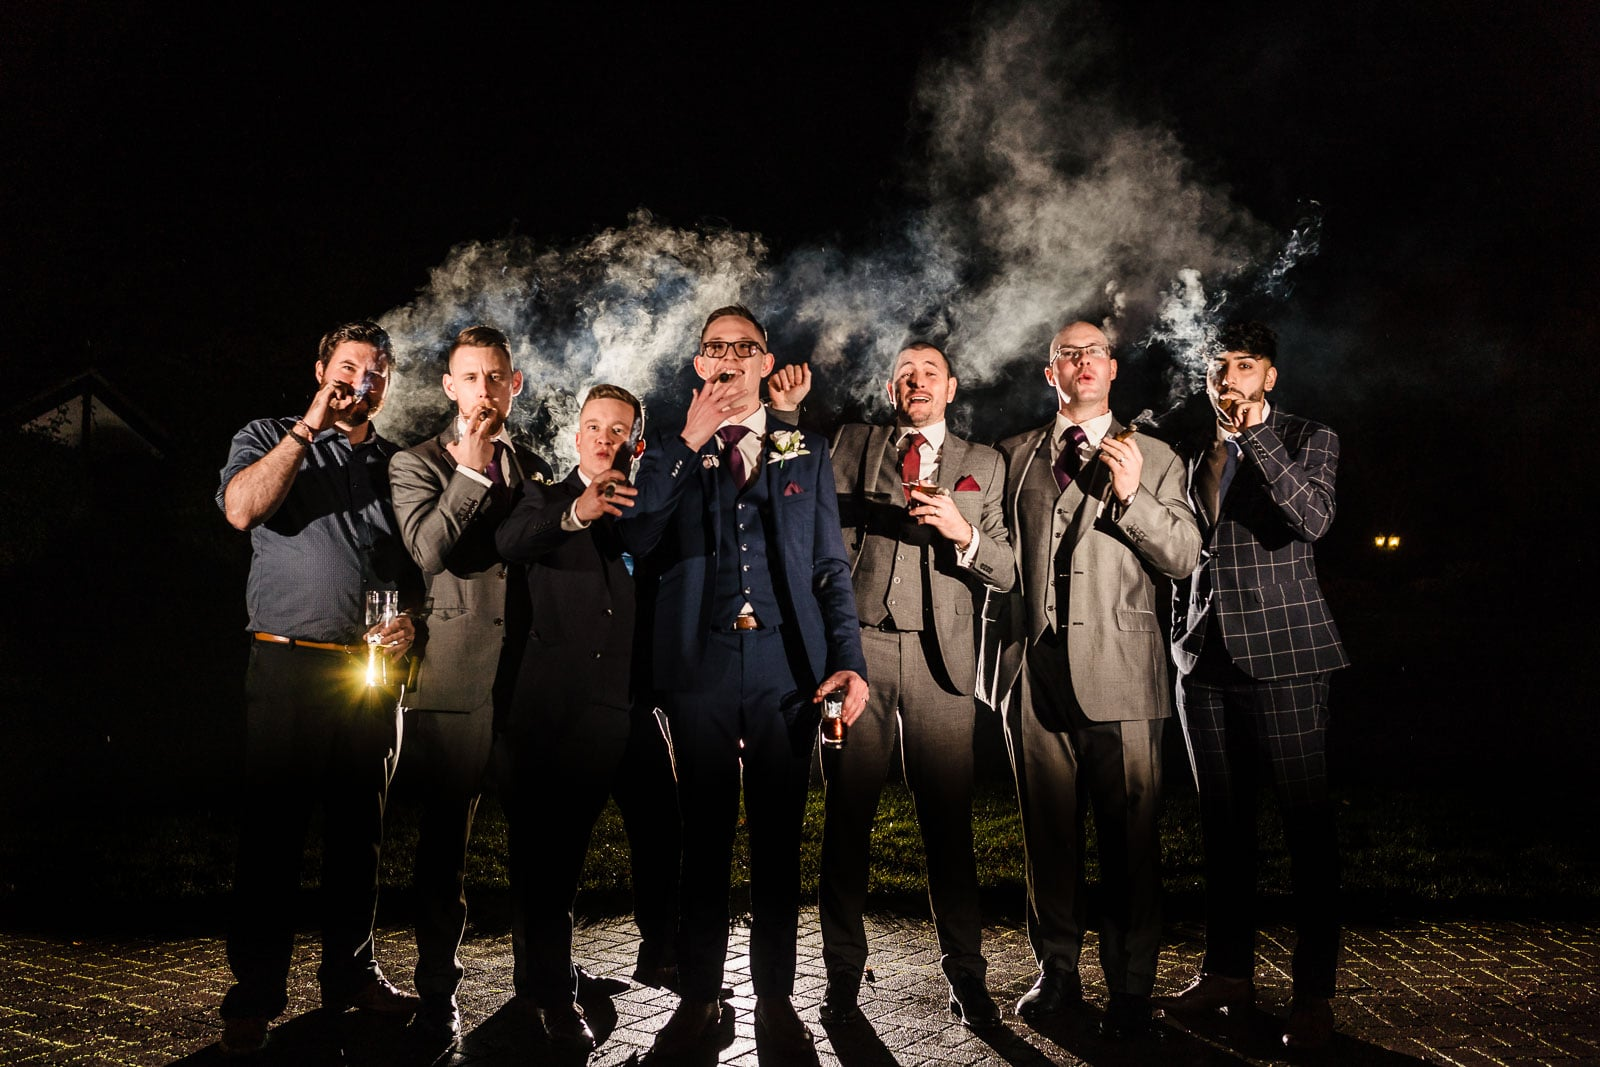 Low light groomsmen cigar photos